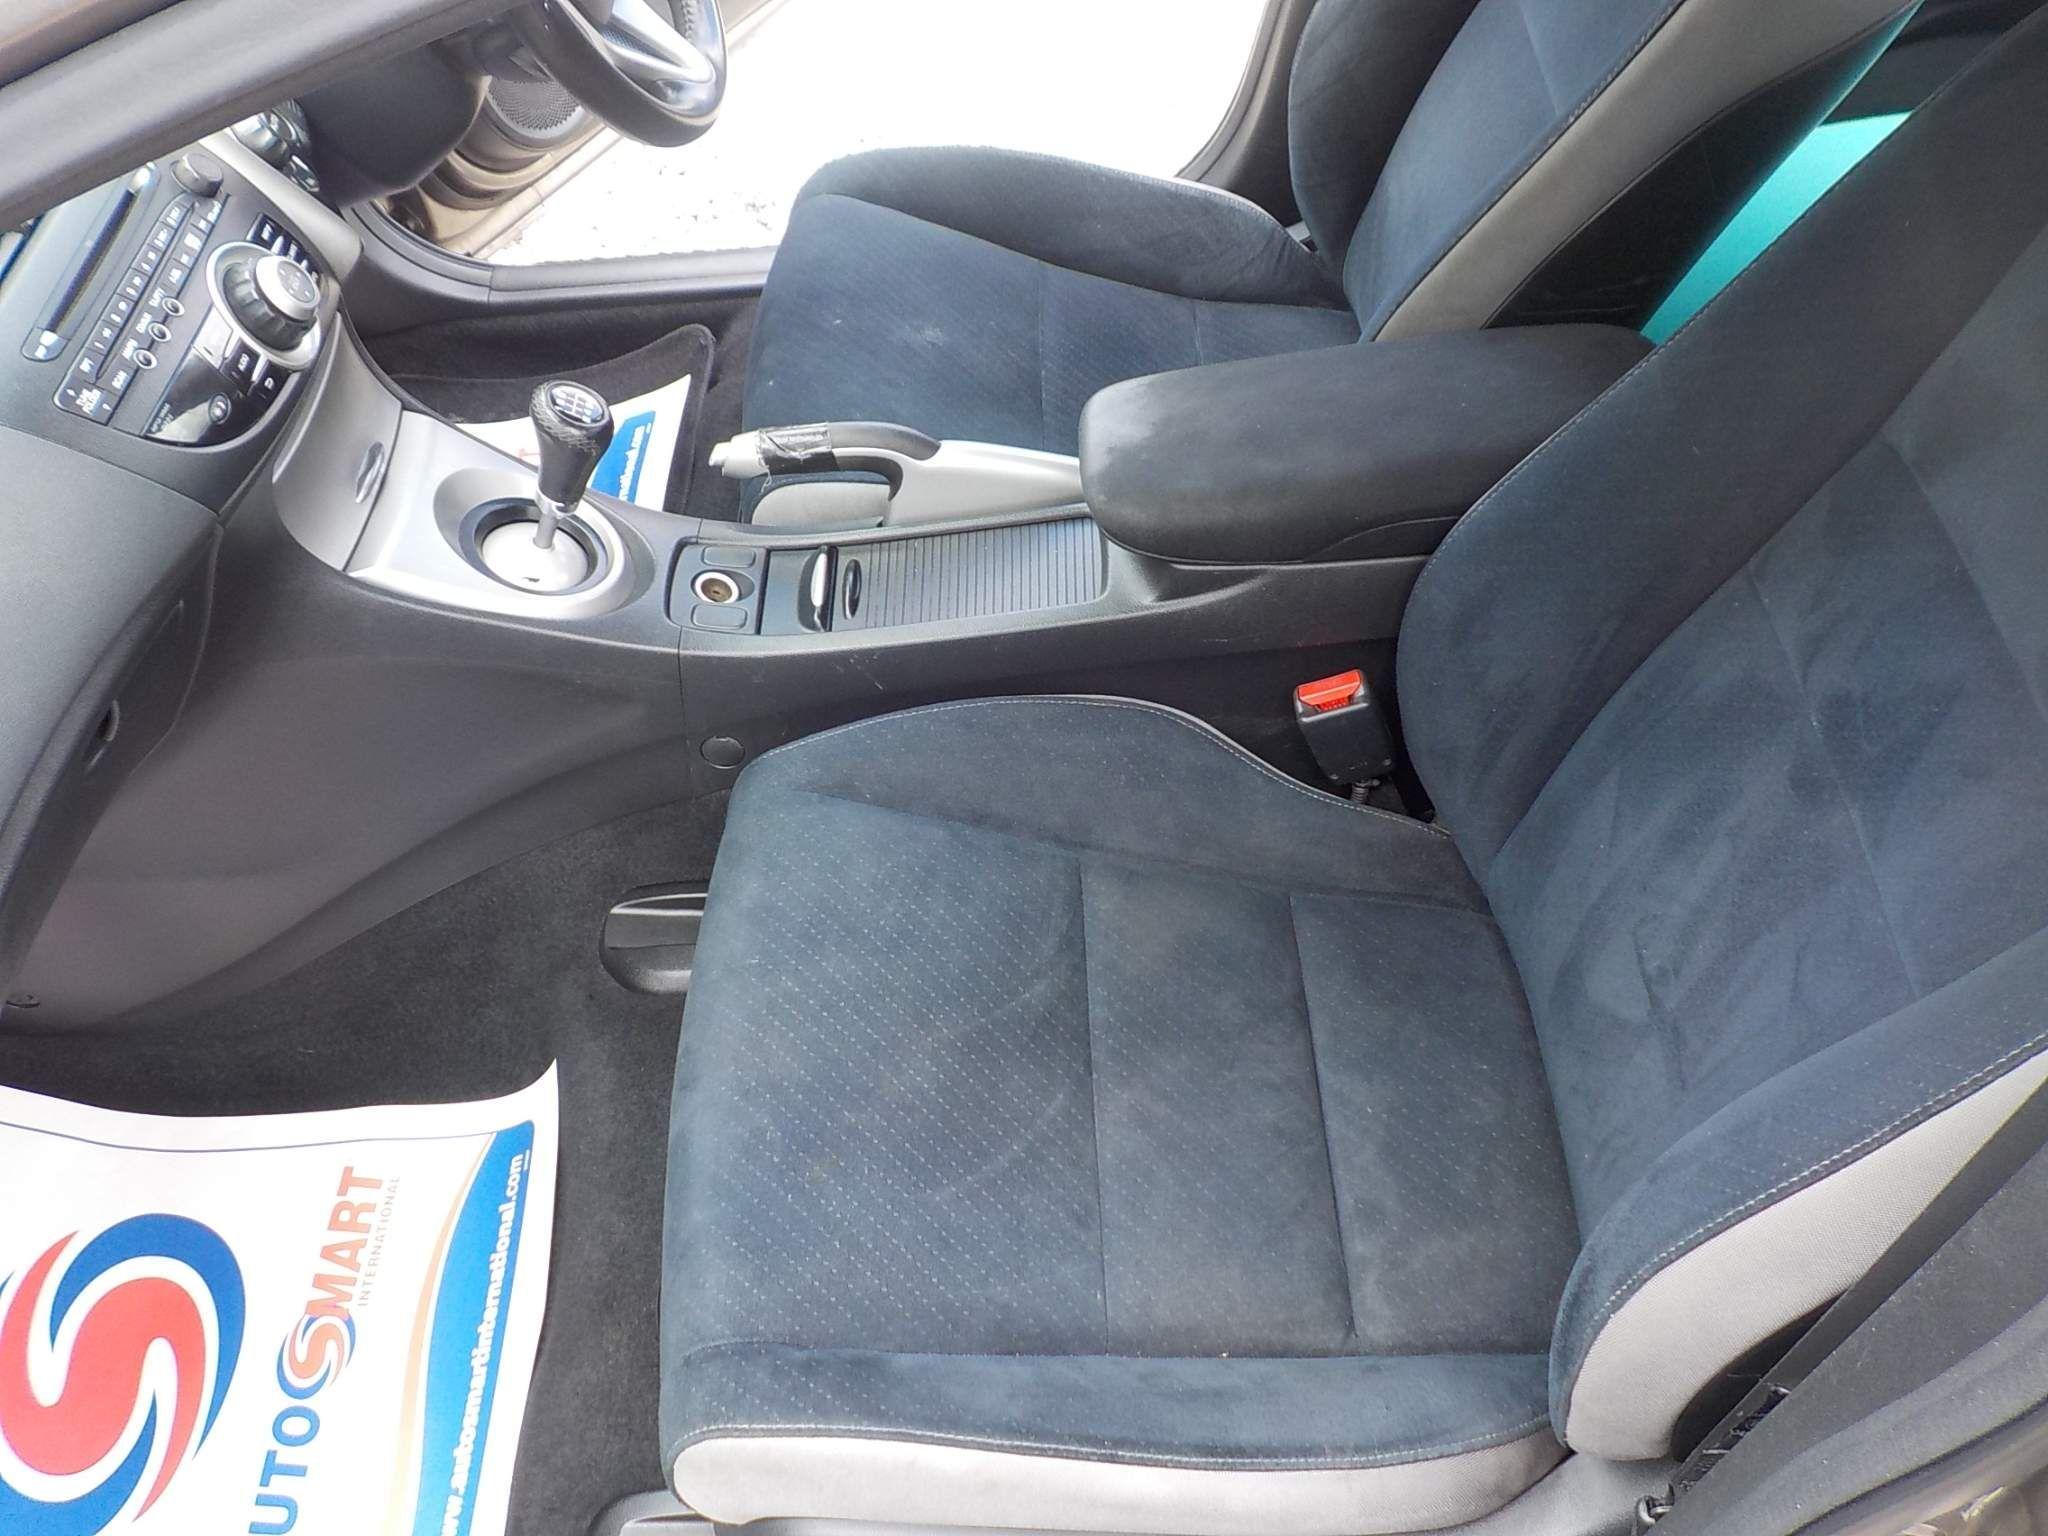 Honda Civic 1.8 i-VTEC EX 5dr